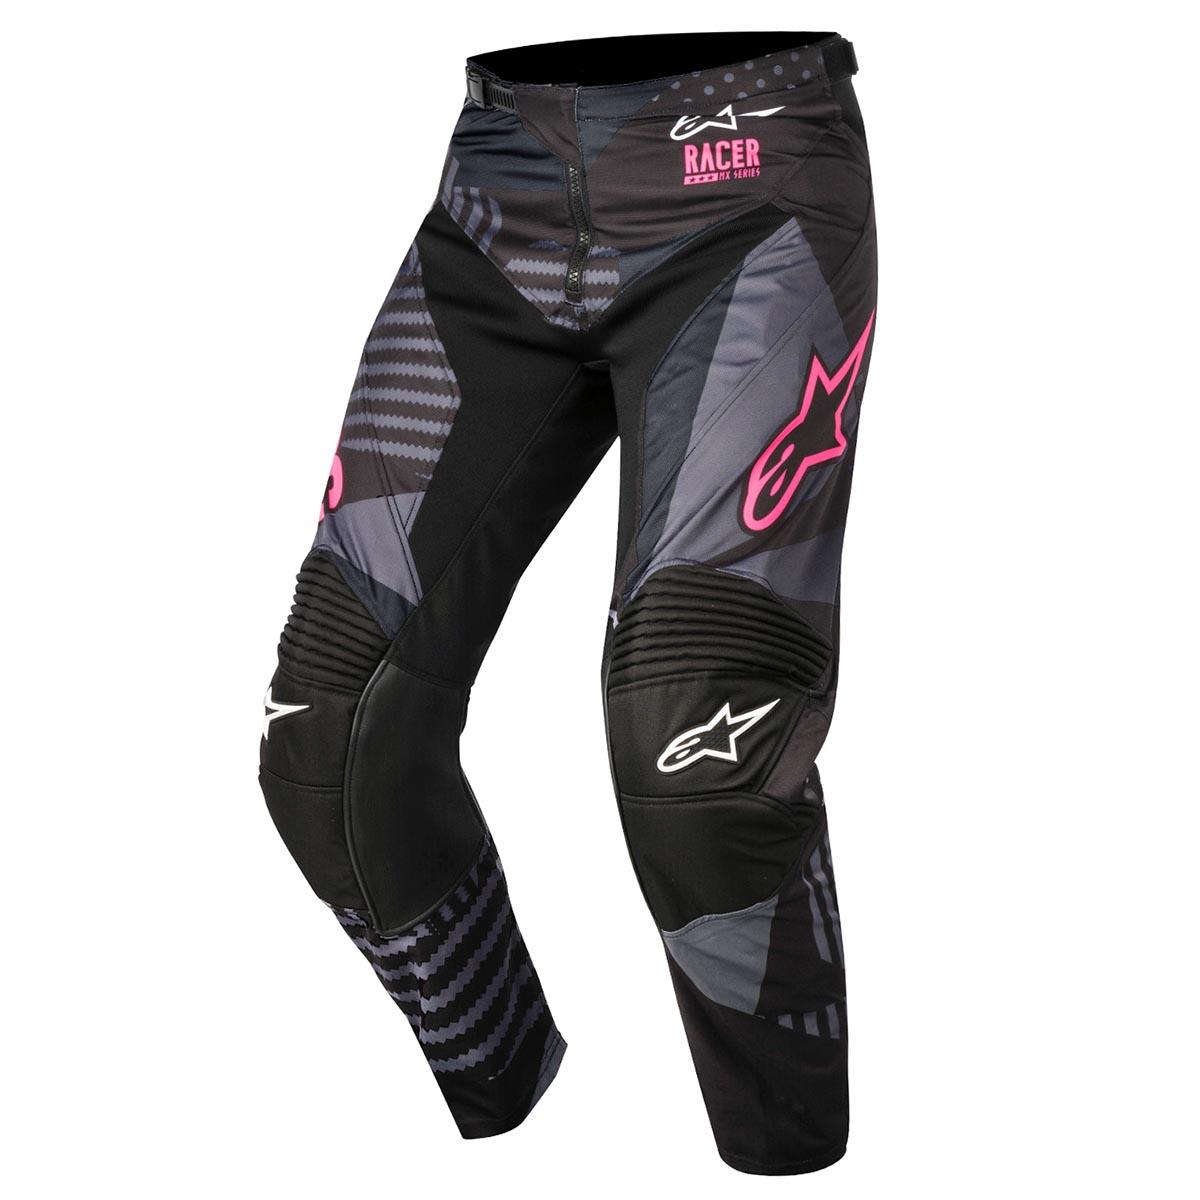 Alpinestars MX Racer Tactical Pants 2020 Pantalones de motocross